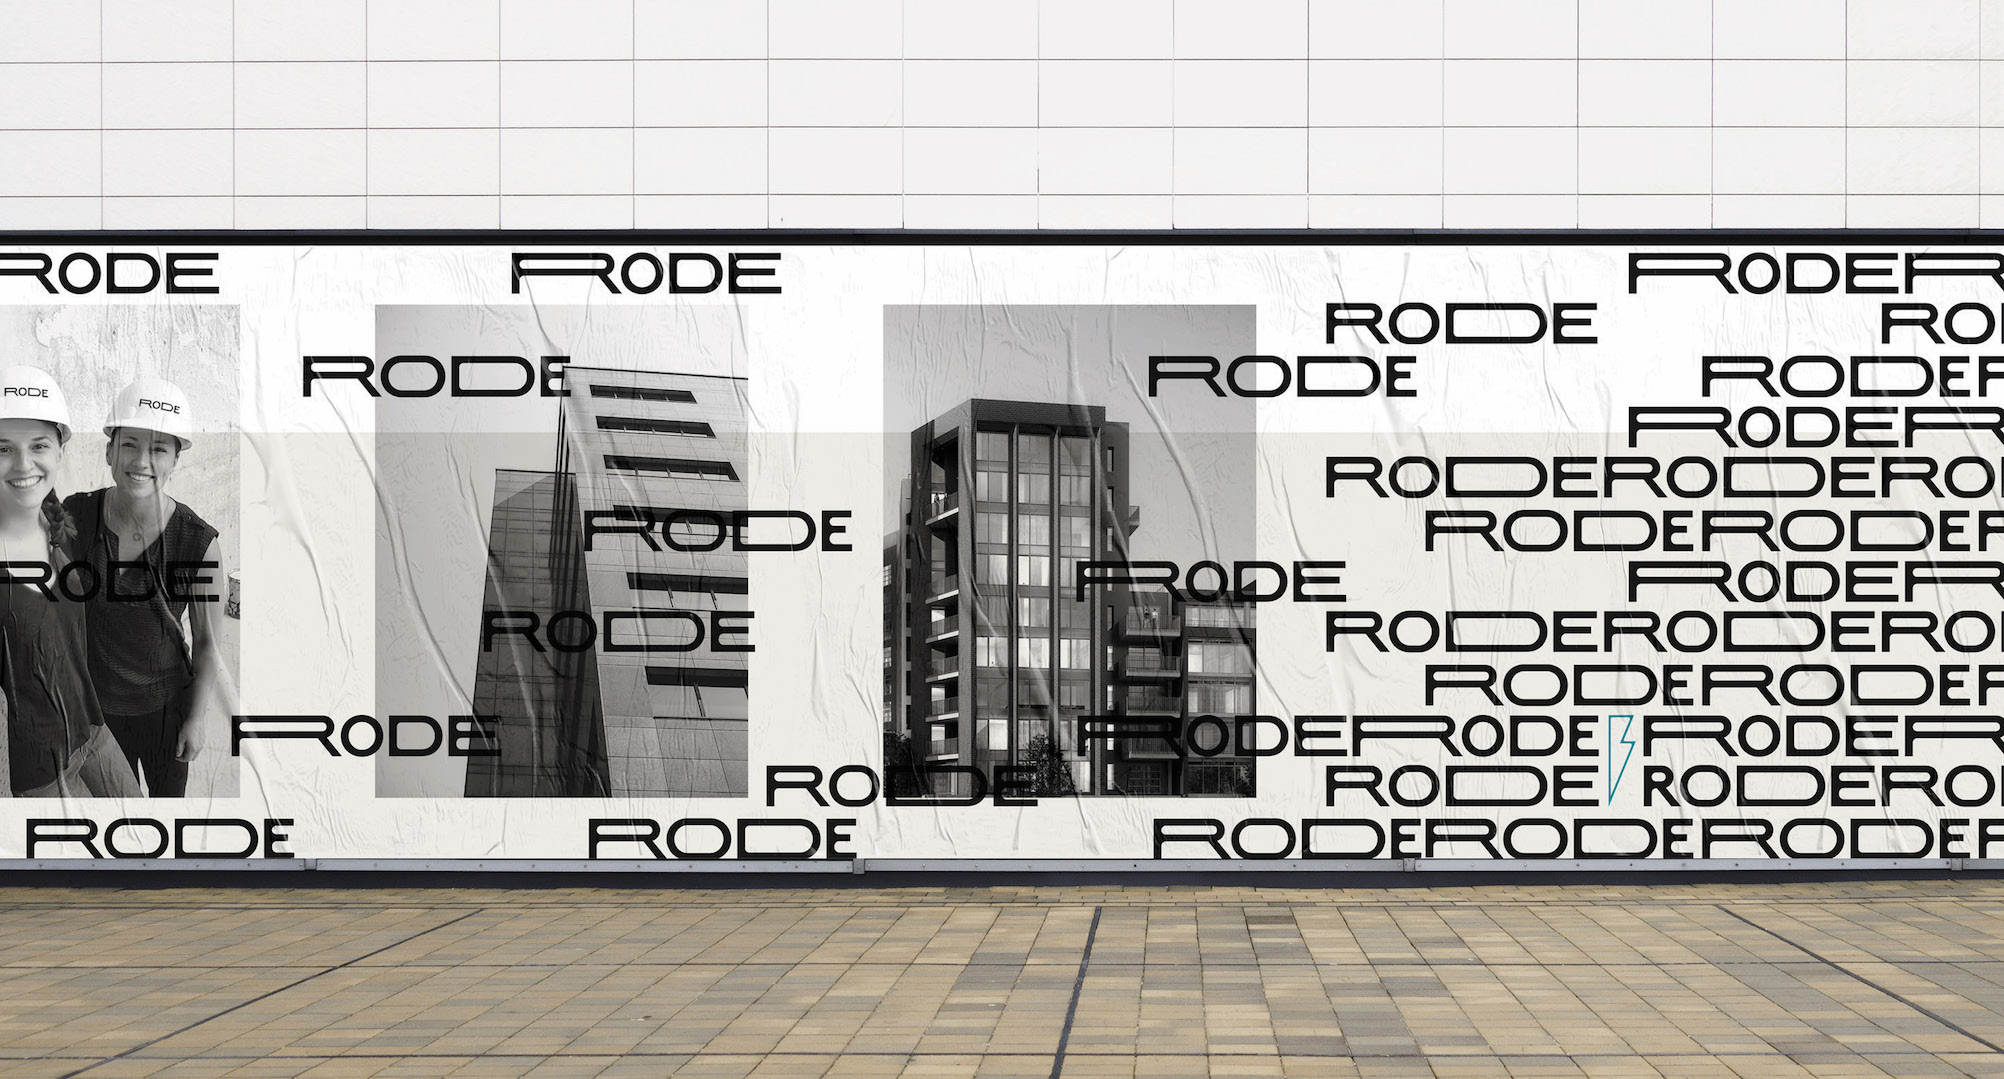 RODE Architects Branding